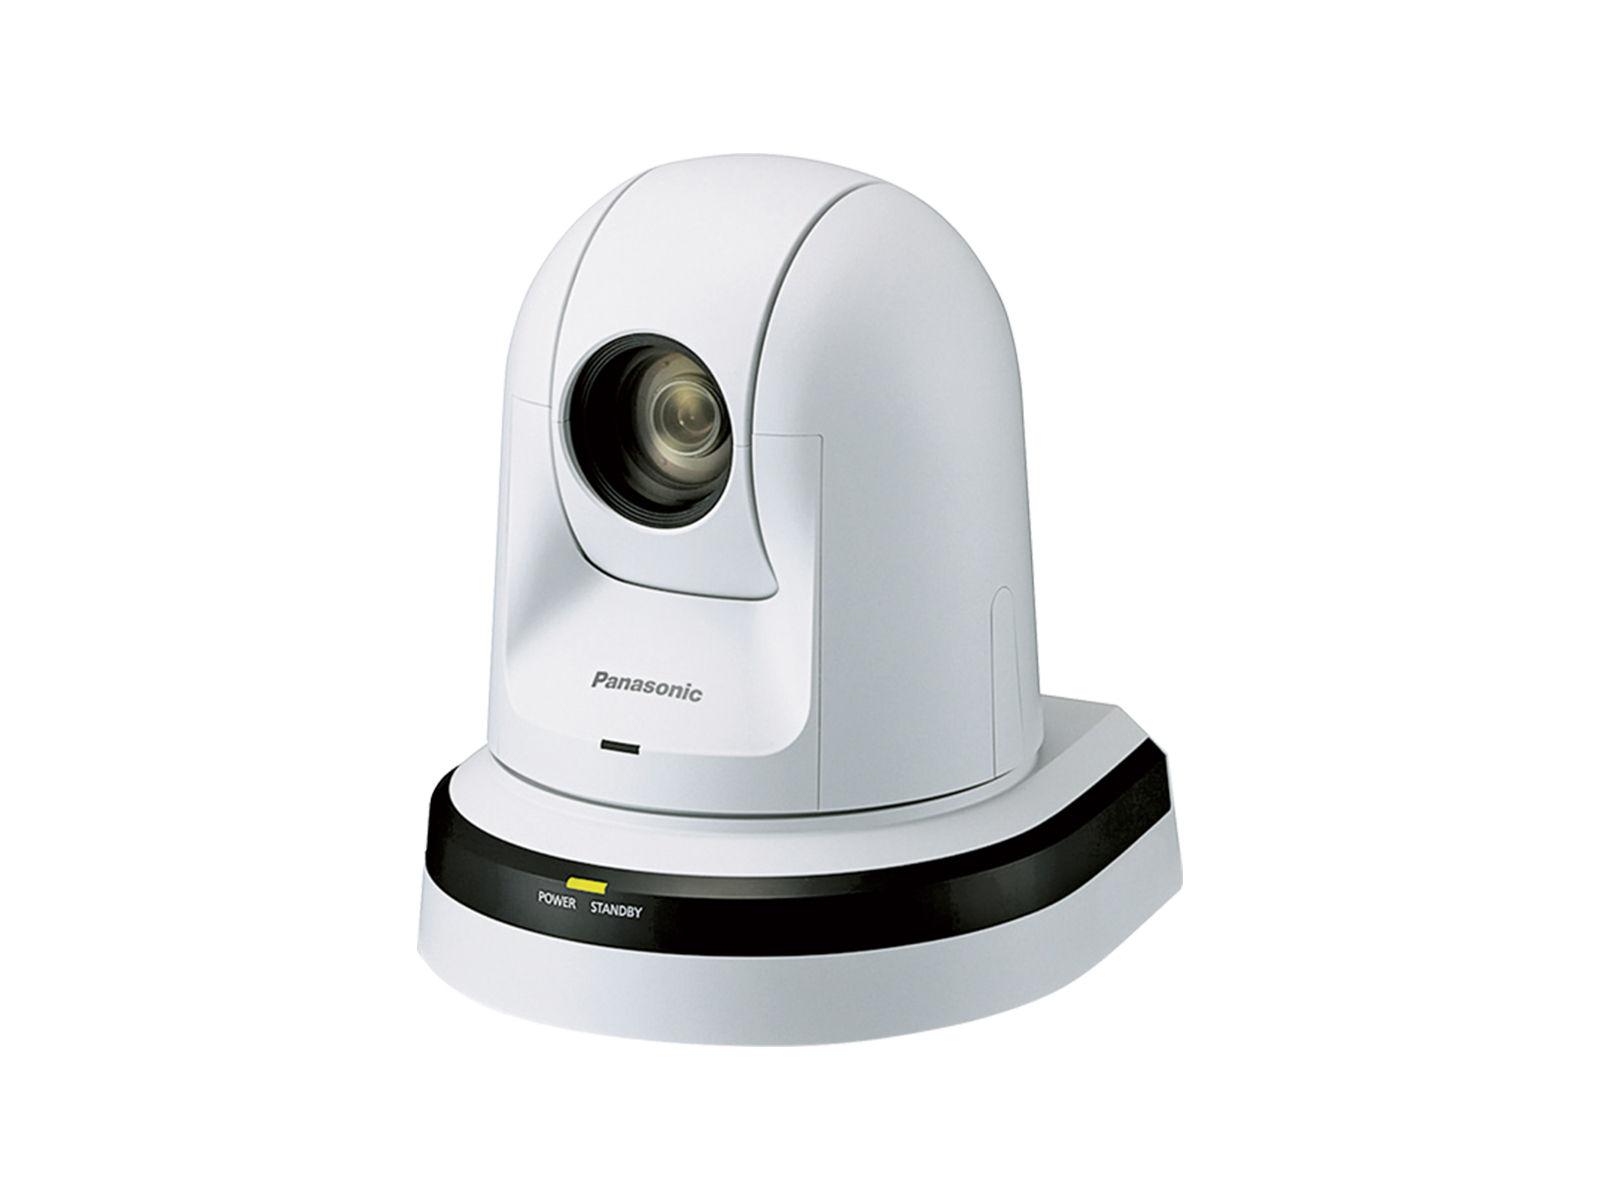 Panasonic AW-HN38HWEJ | HD-Kamera, PTZ, HDMI, NDI / HX support, 1/2,3-Typ-MOS, 22fach optischer Zoom, weiss